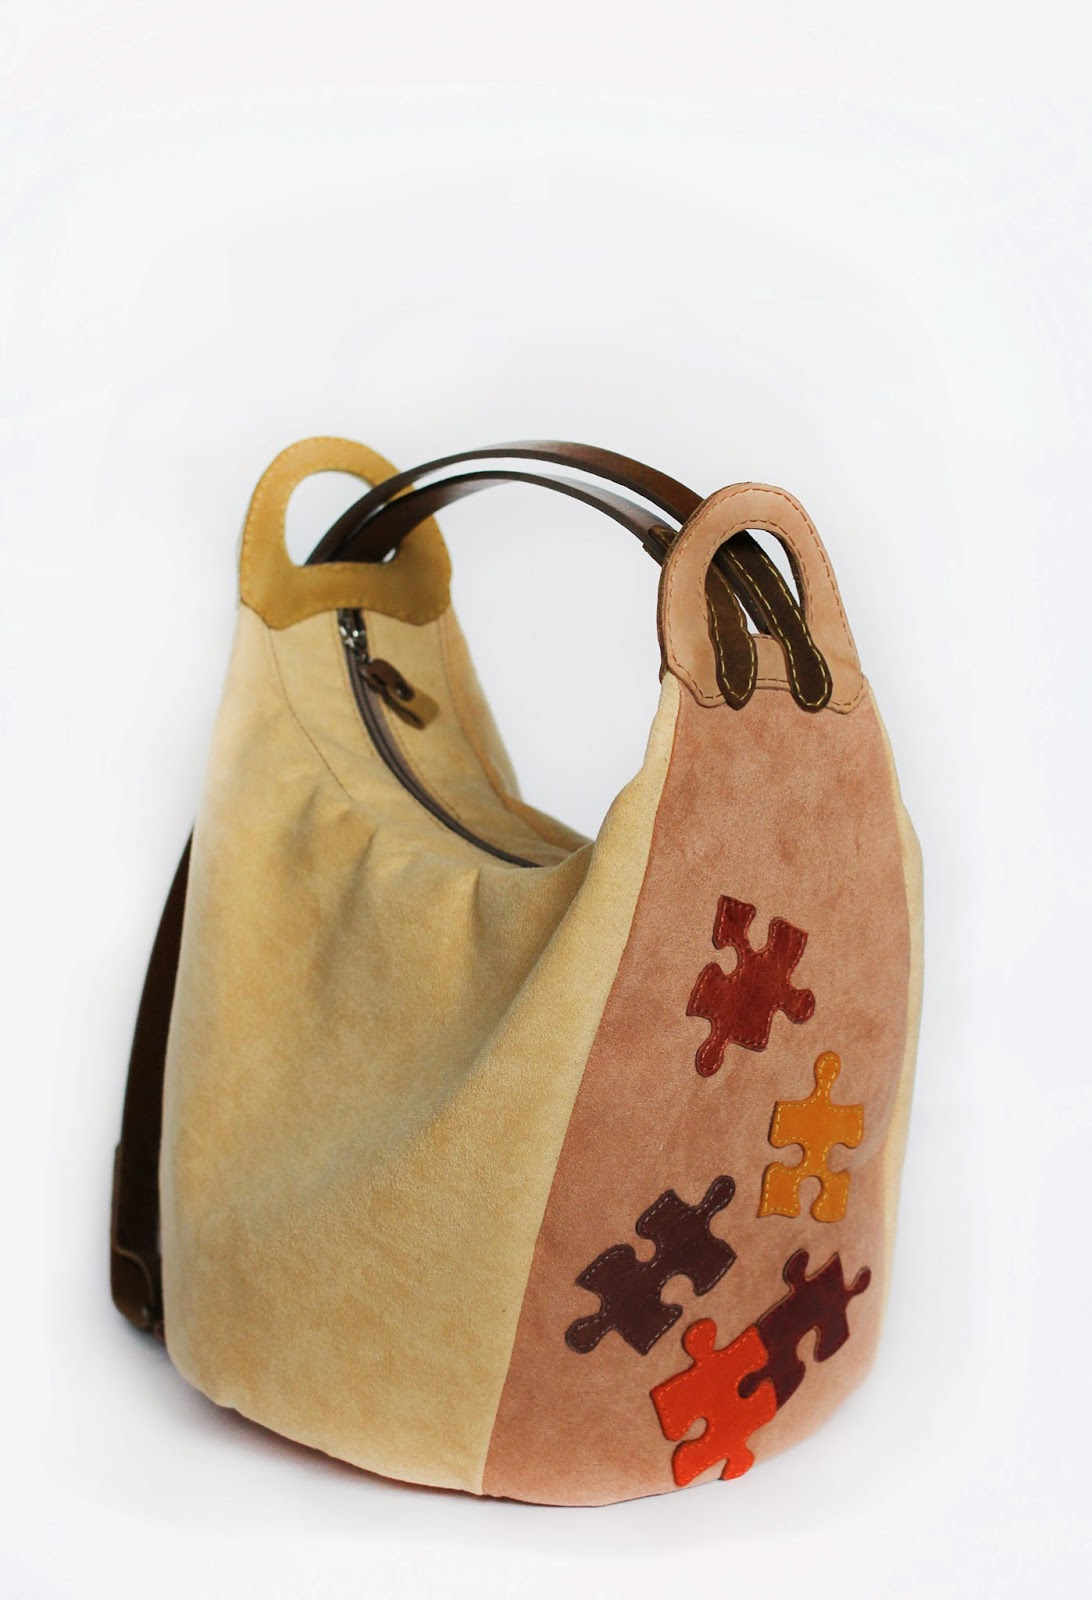 Рюкзак сумка своими руками 22